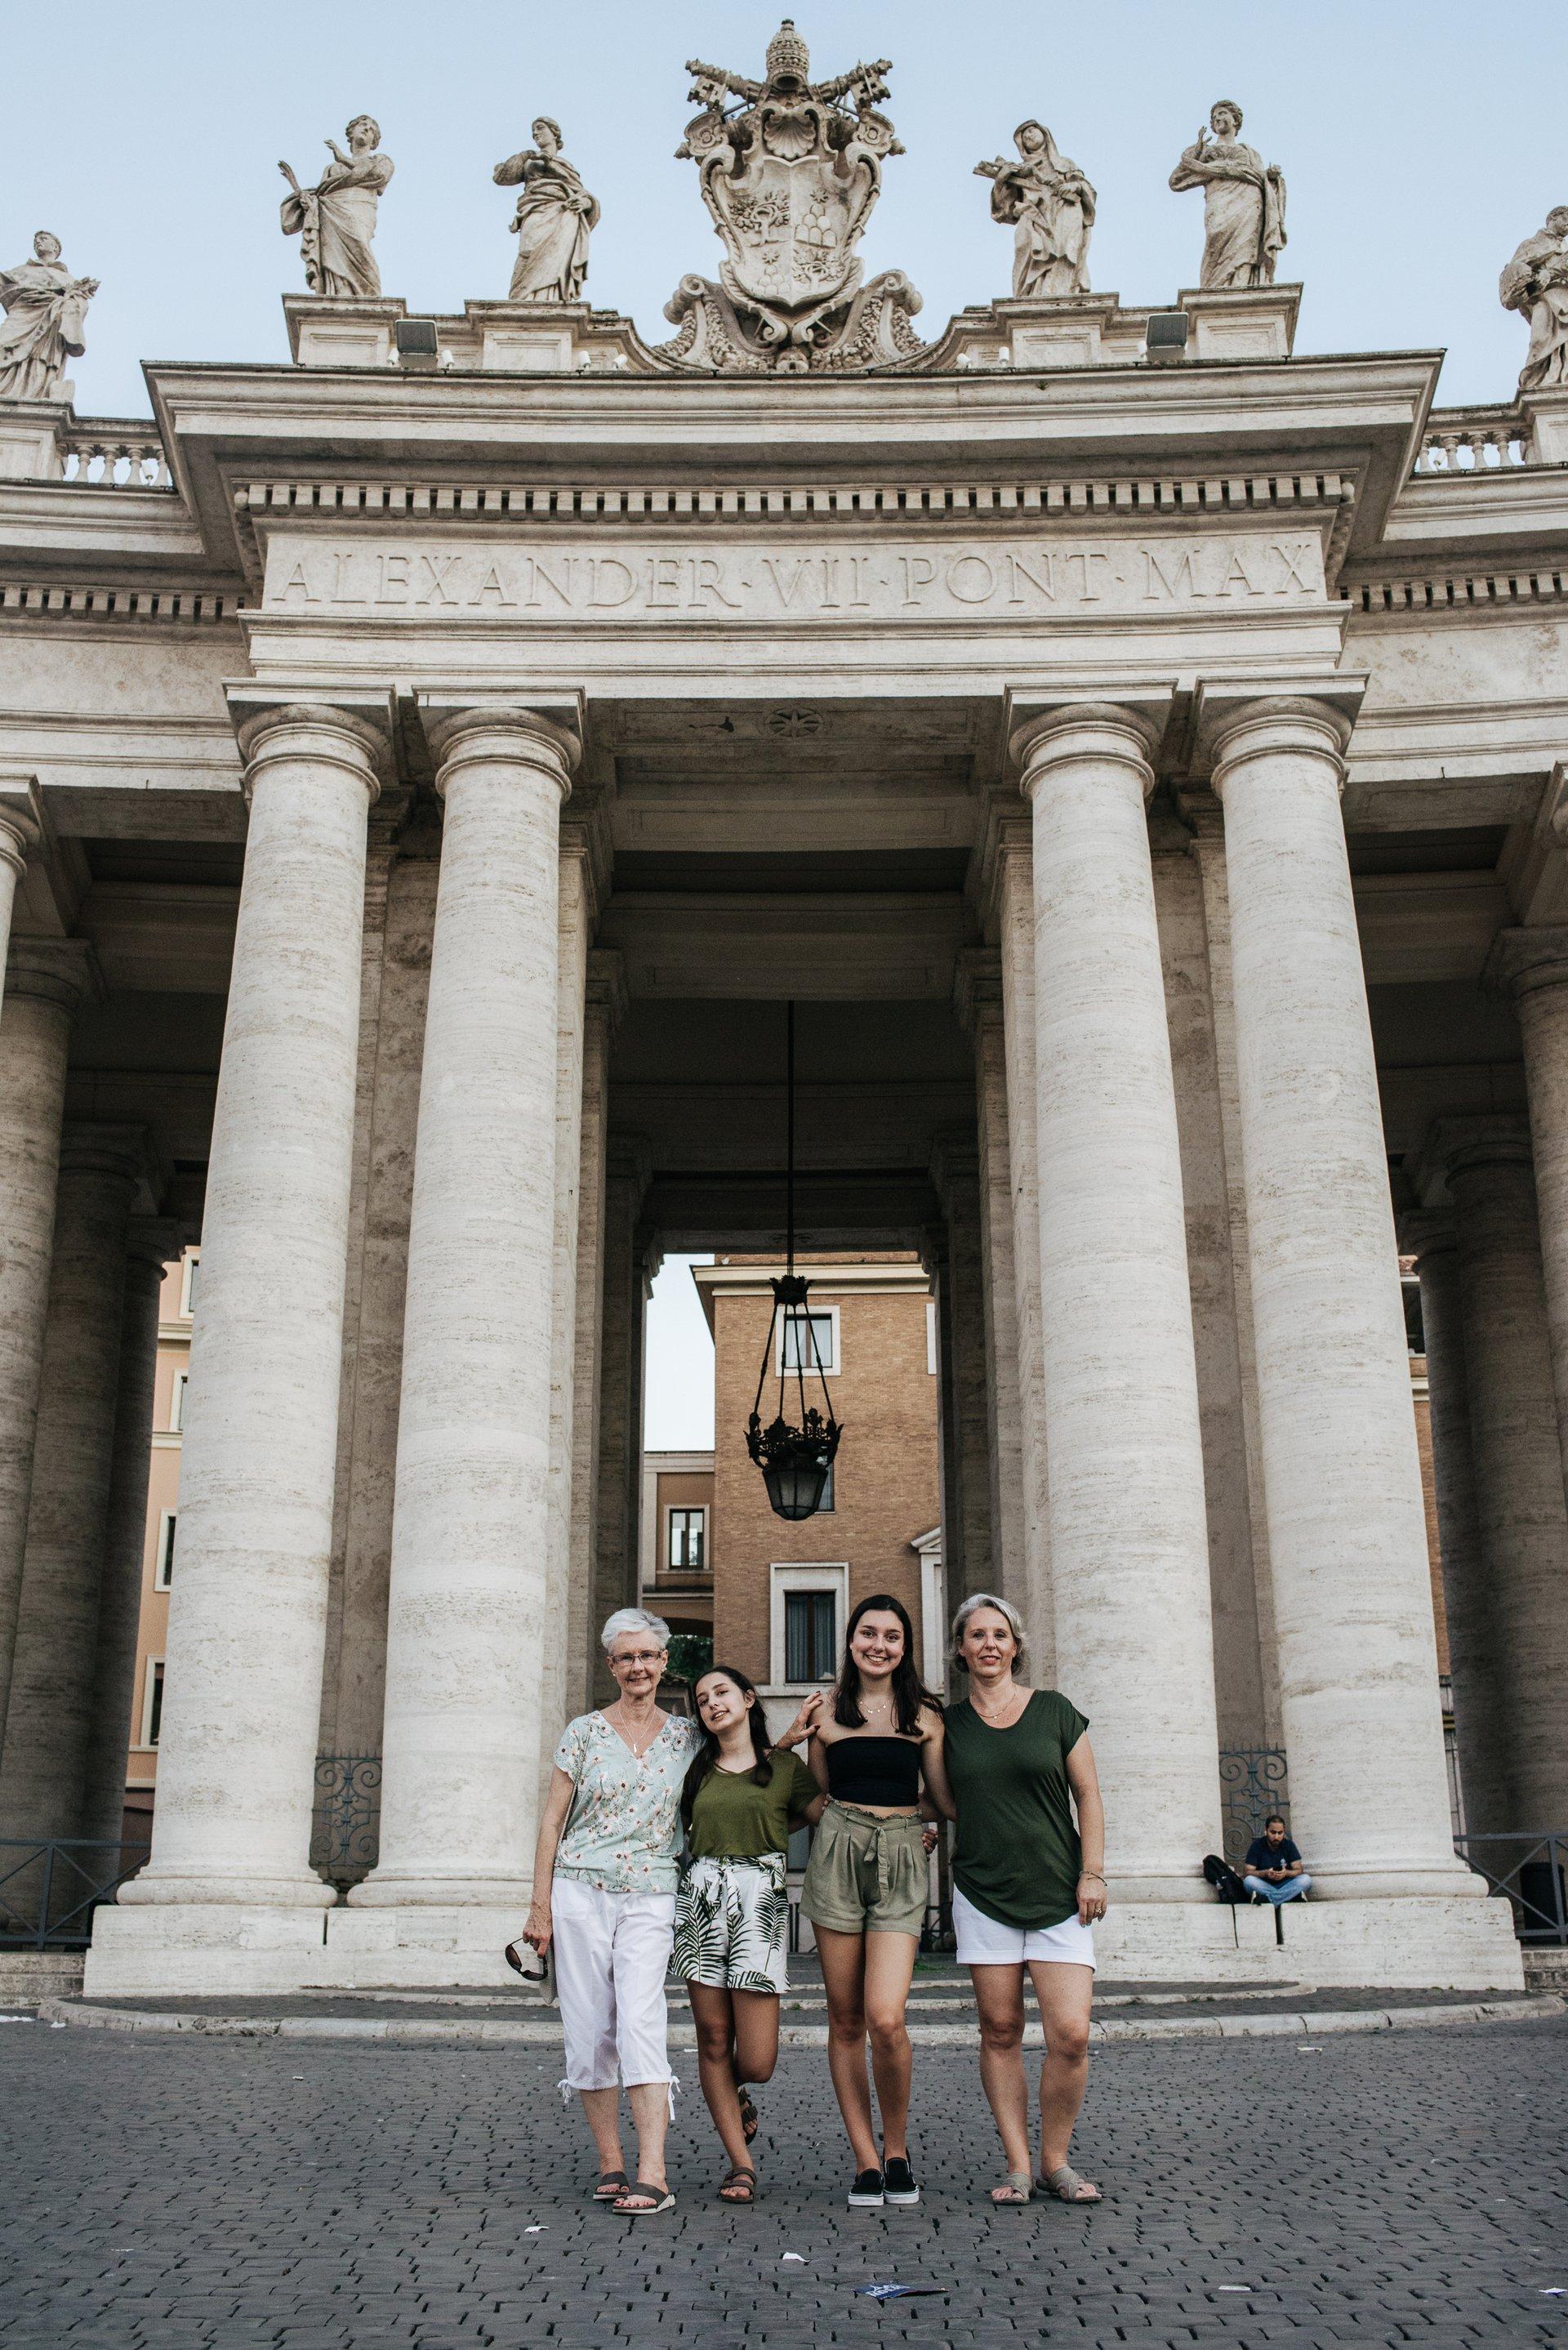 Rome-Italy-travel-story-Flytographer-6